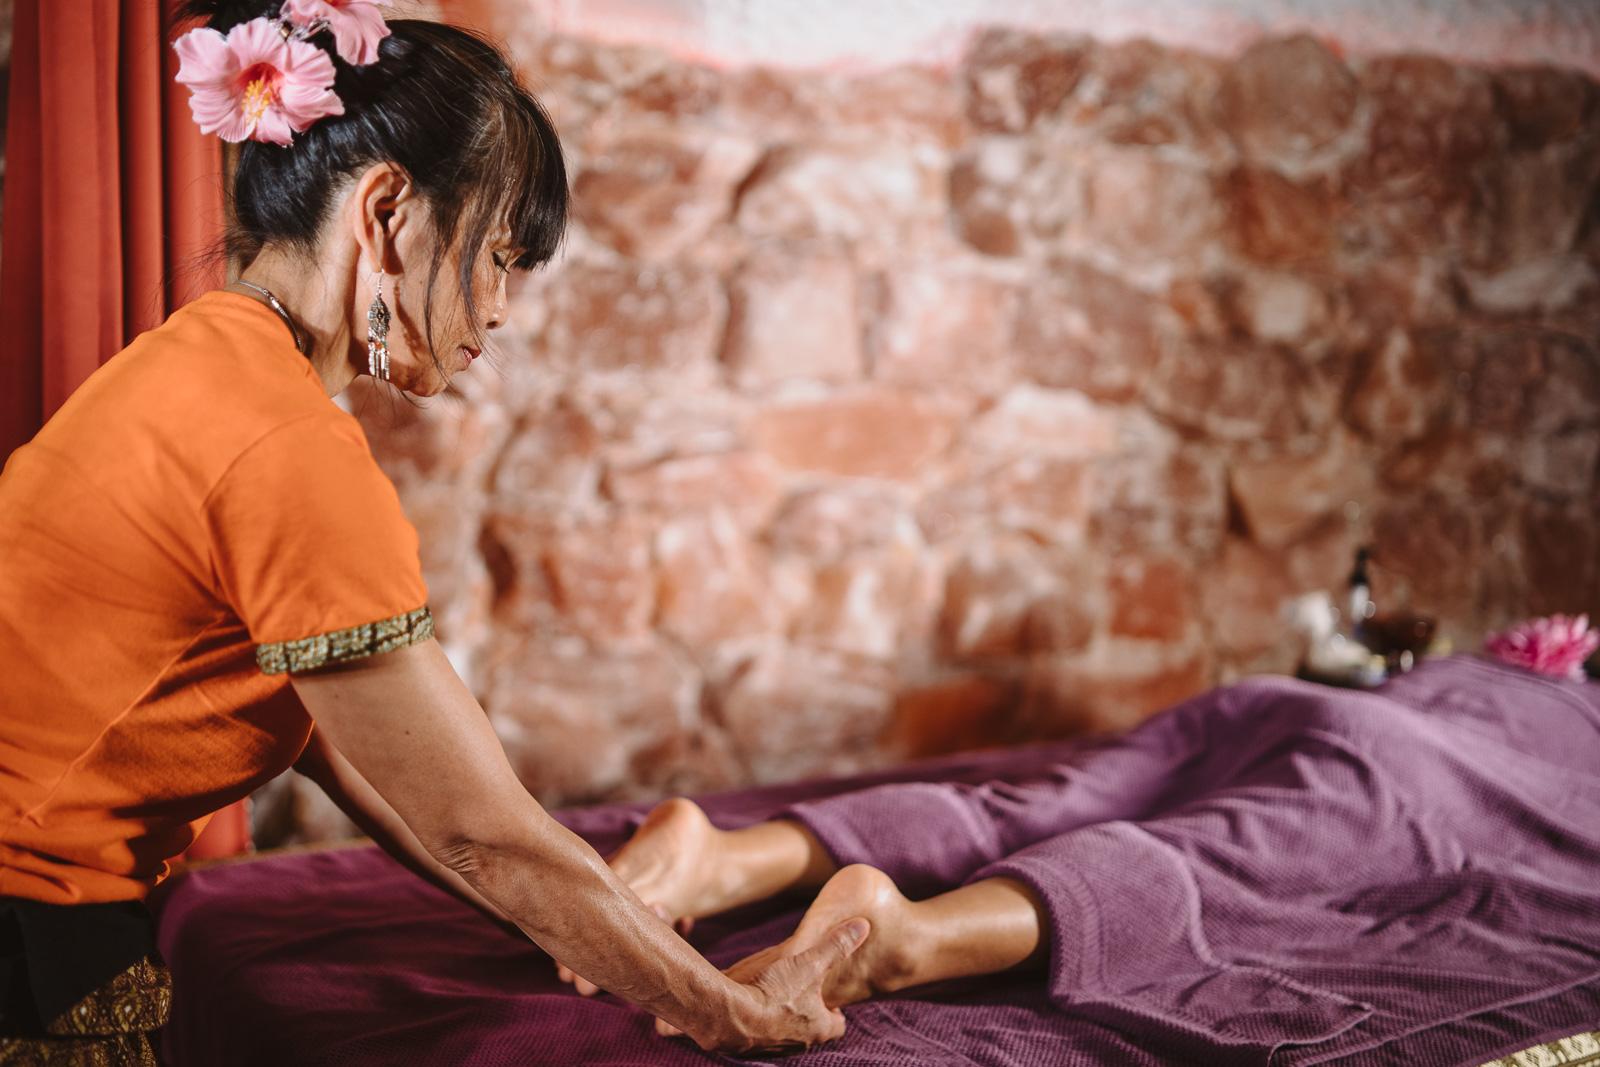 Unternehmensreportage - Salzgrotte Beuel Vital - Massage